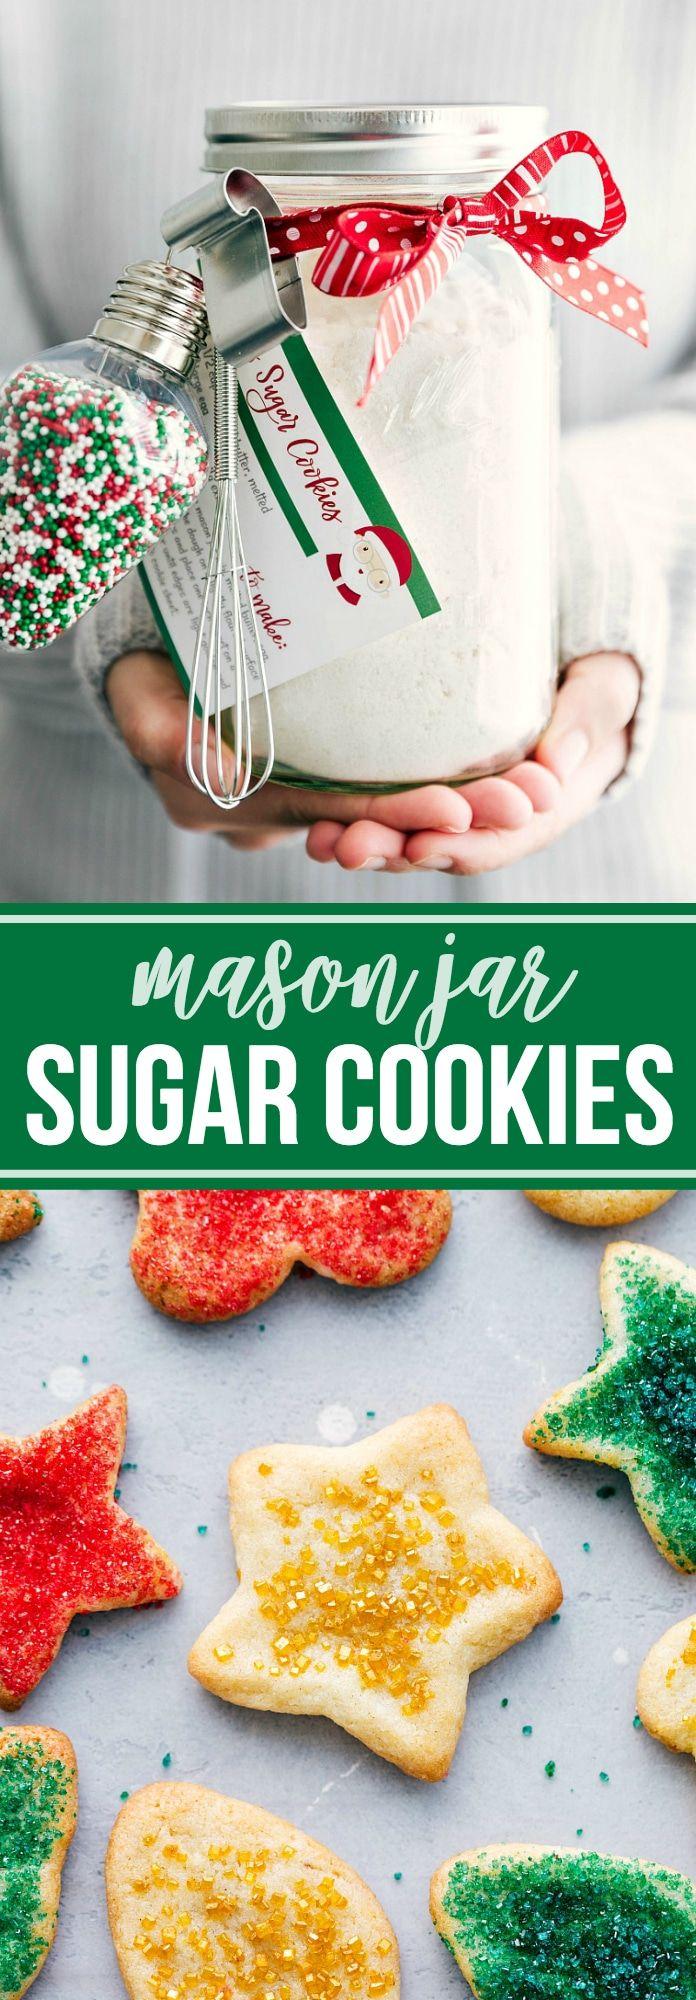 Mason Jar Sugar Cookies | Chelsea's Messy Apron